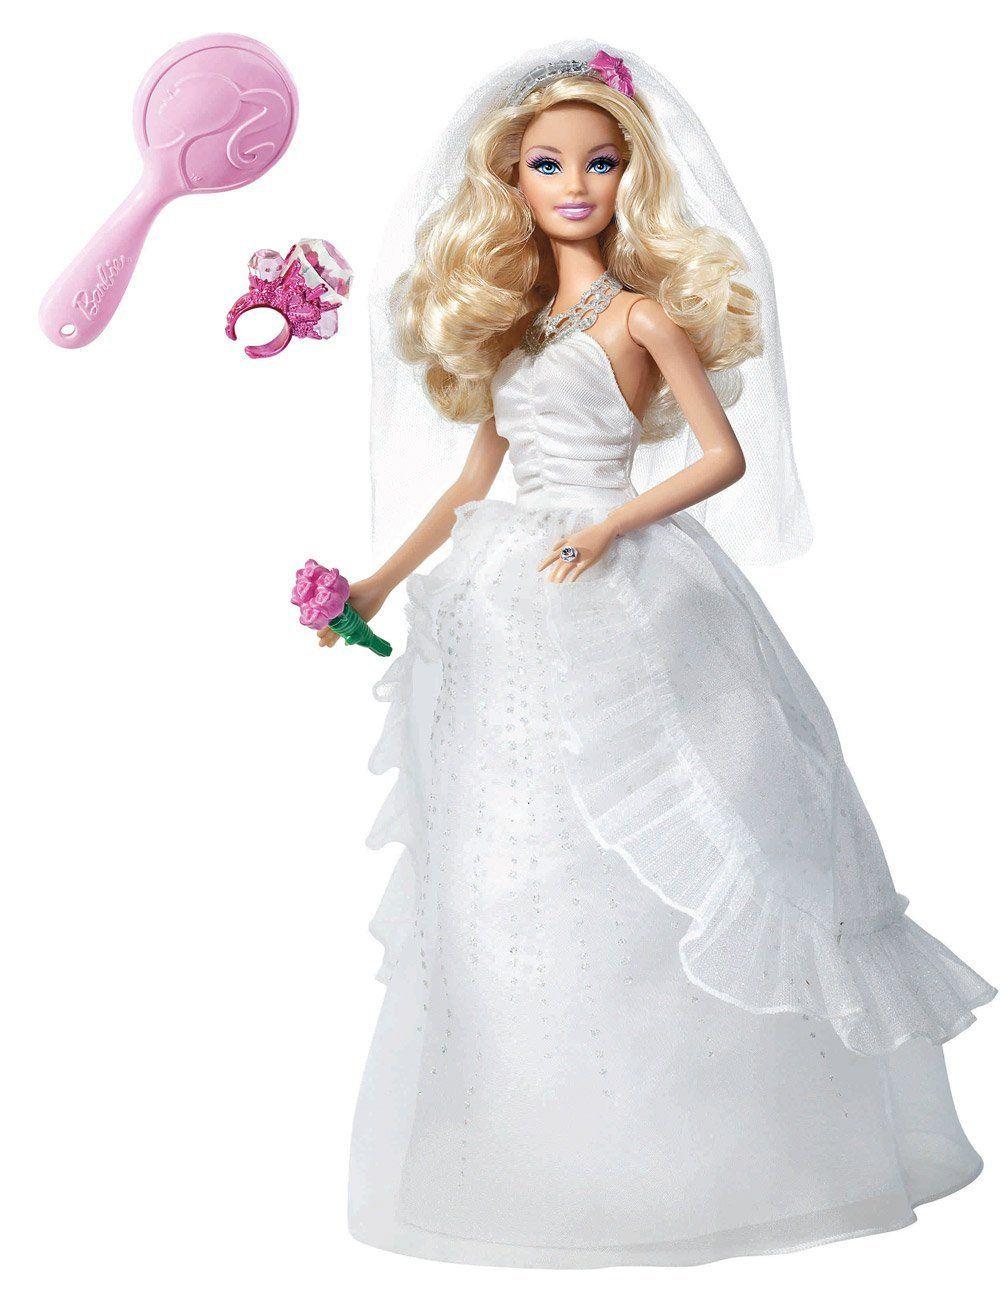 Pin By Jooana On Wedding Ideas For You Barbie Wedding Barbie